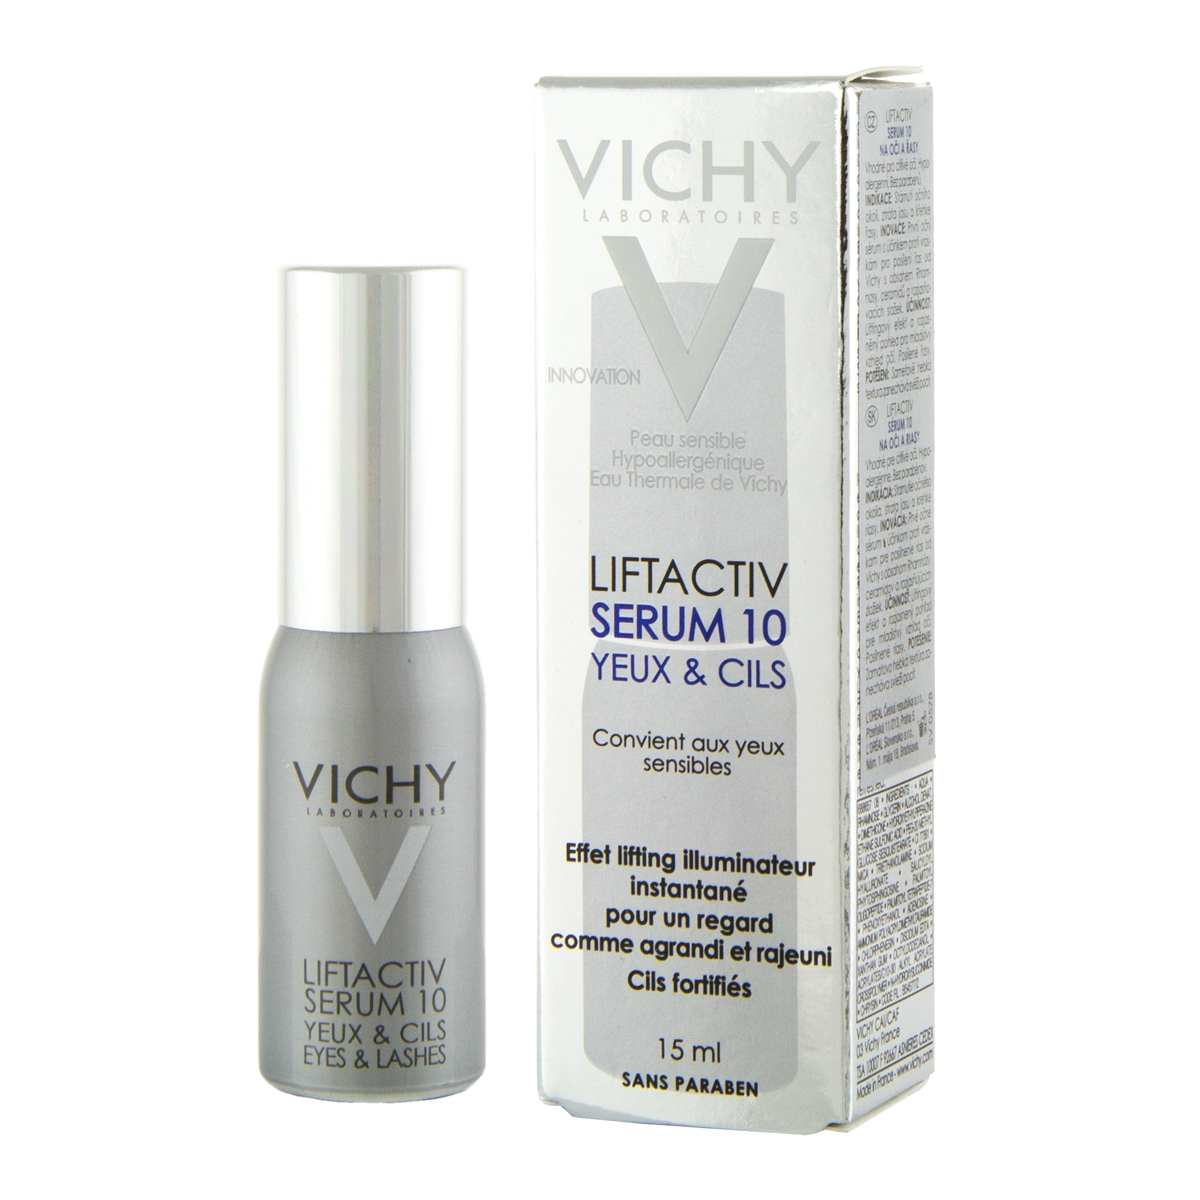 Vichy Liftactiv Derm Source Serum 10 15 ml 71046